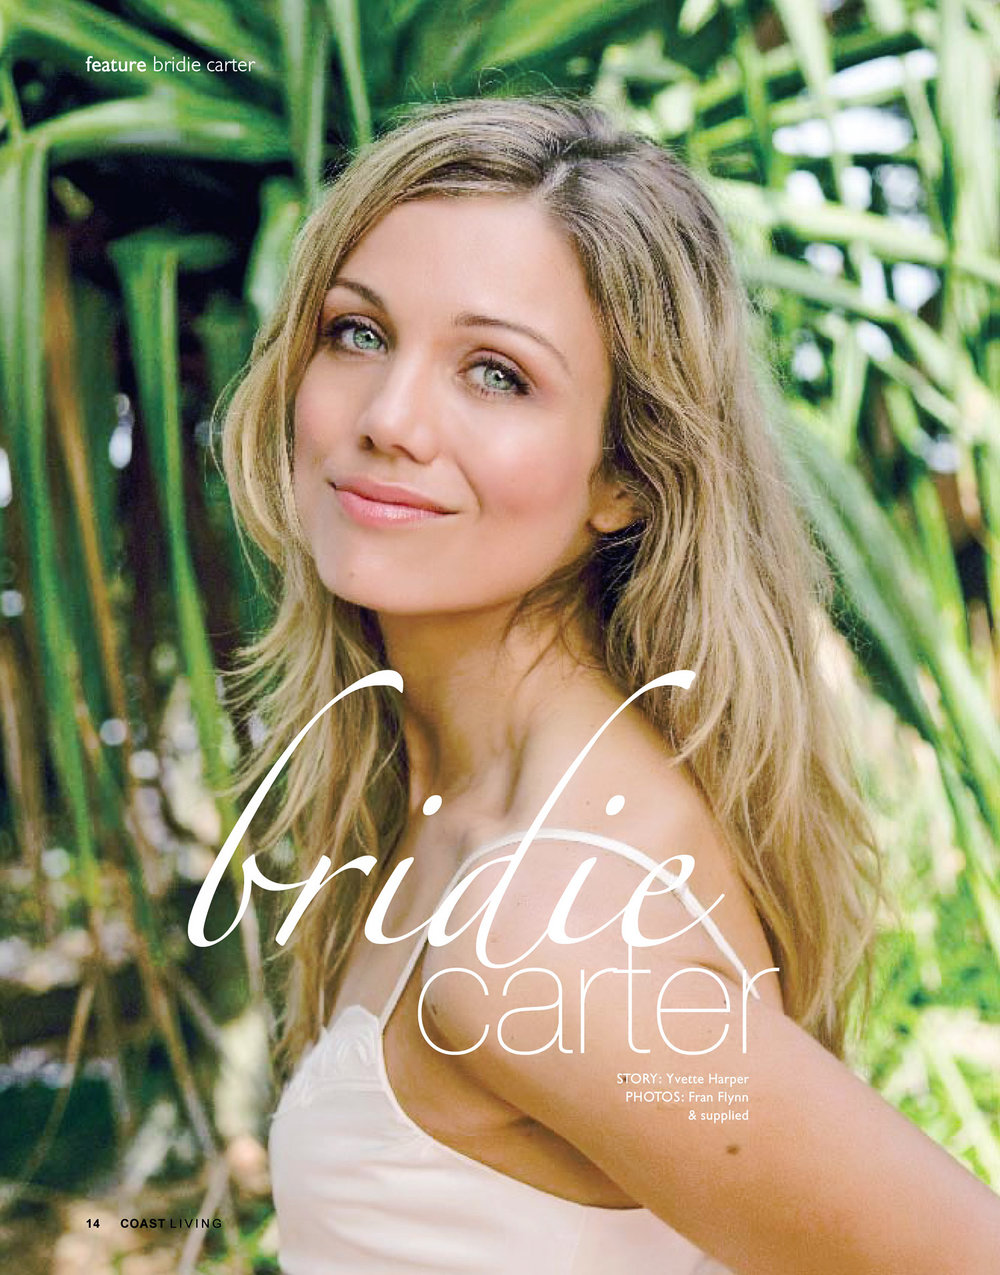 BRIDIE CARTER FOR COAST LIVING MAGAZINE>>